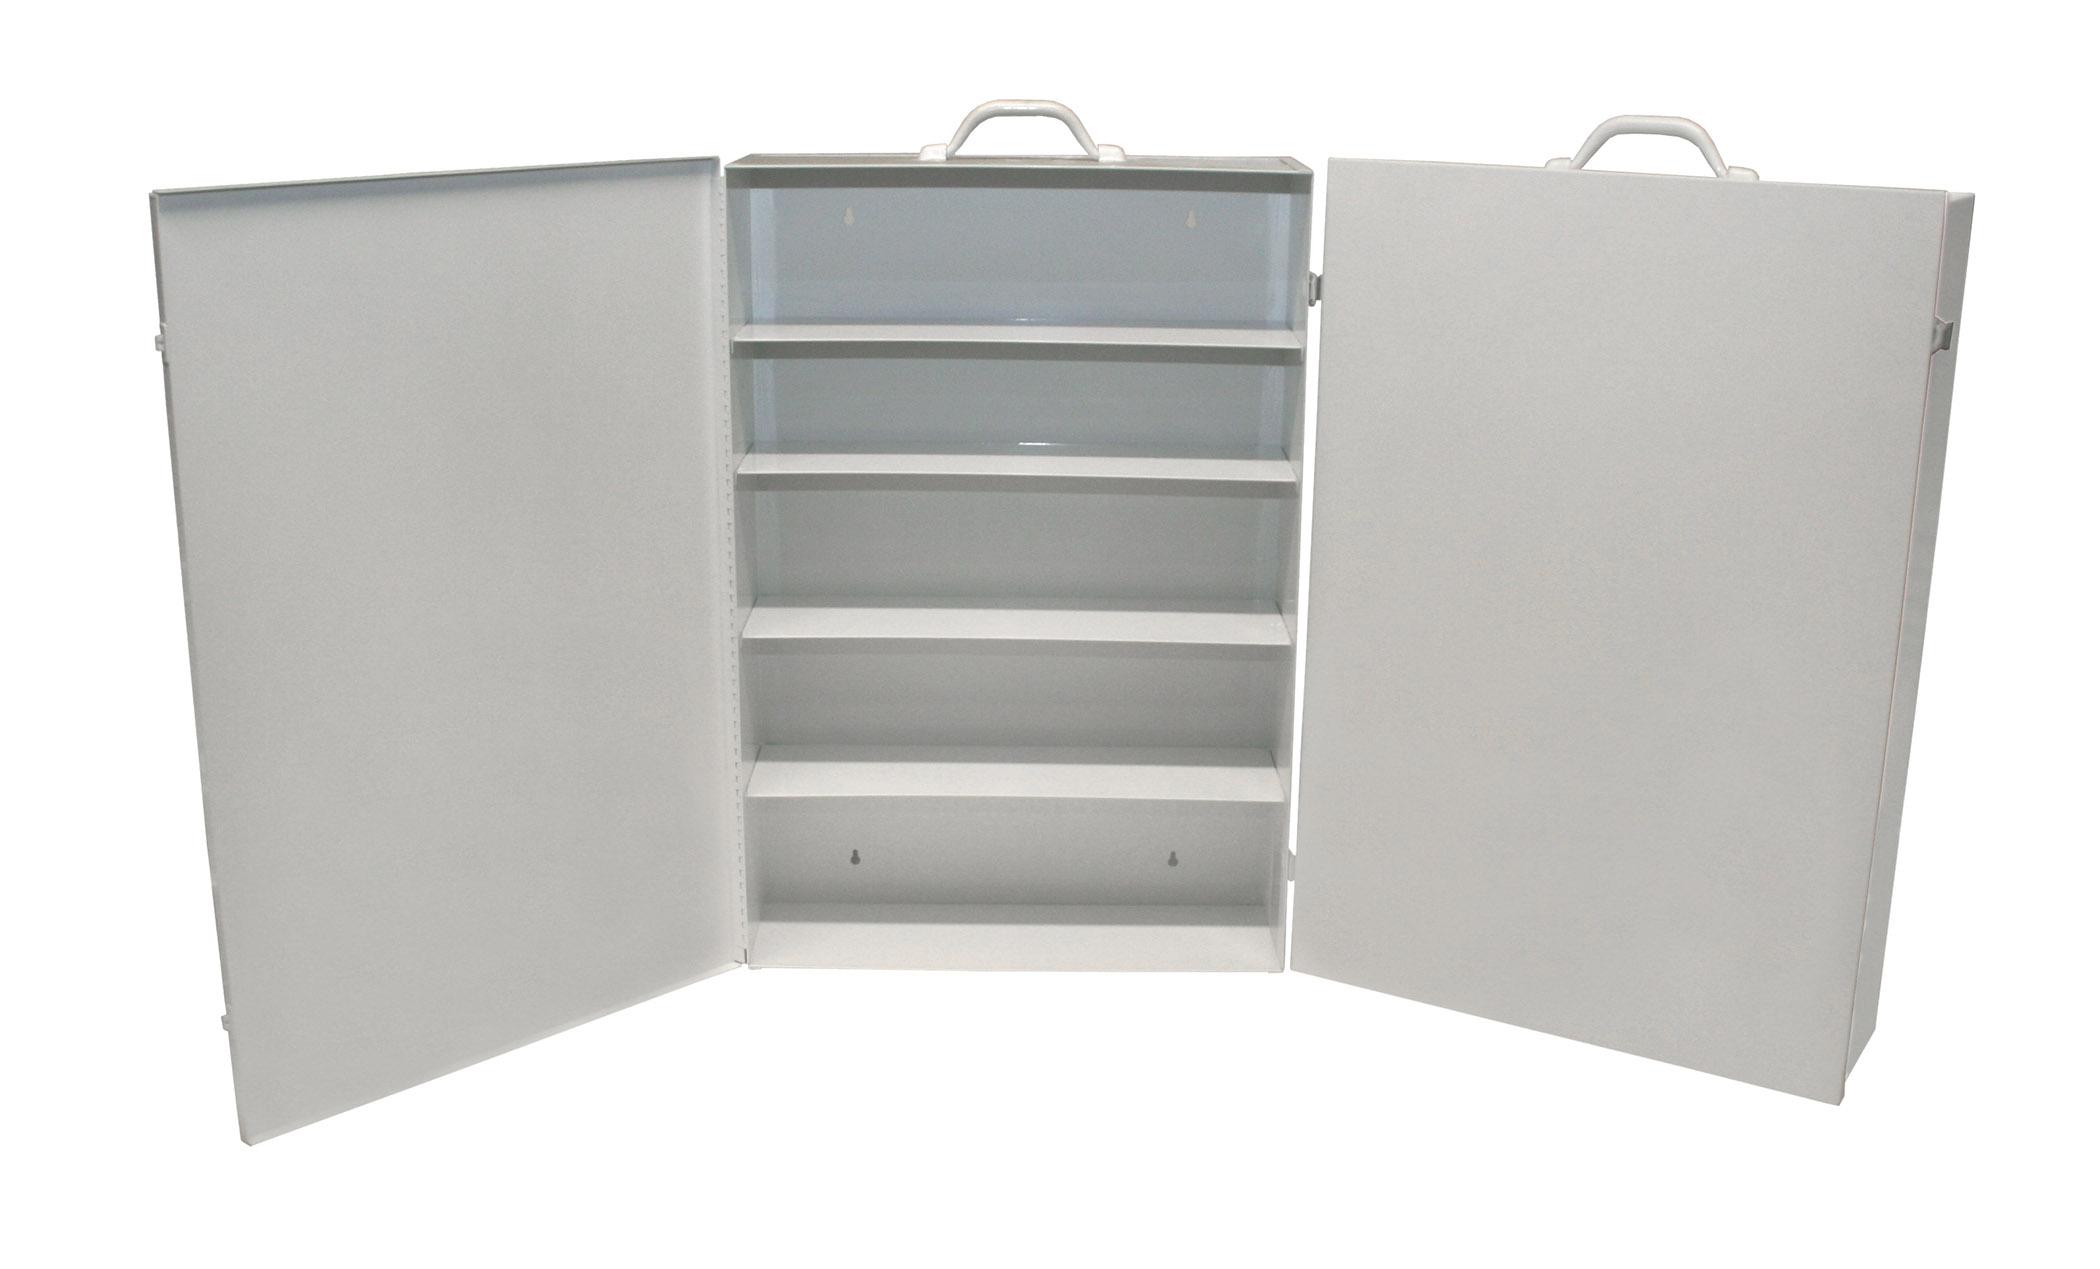 R209-082 --- FAC-5 - FAIC empty cabinet - web